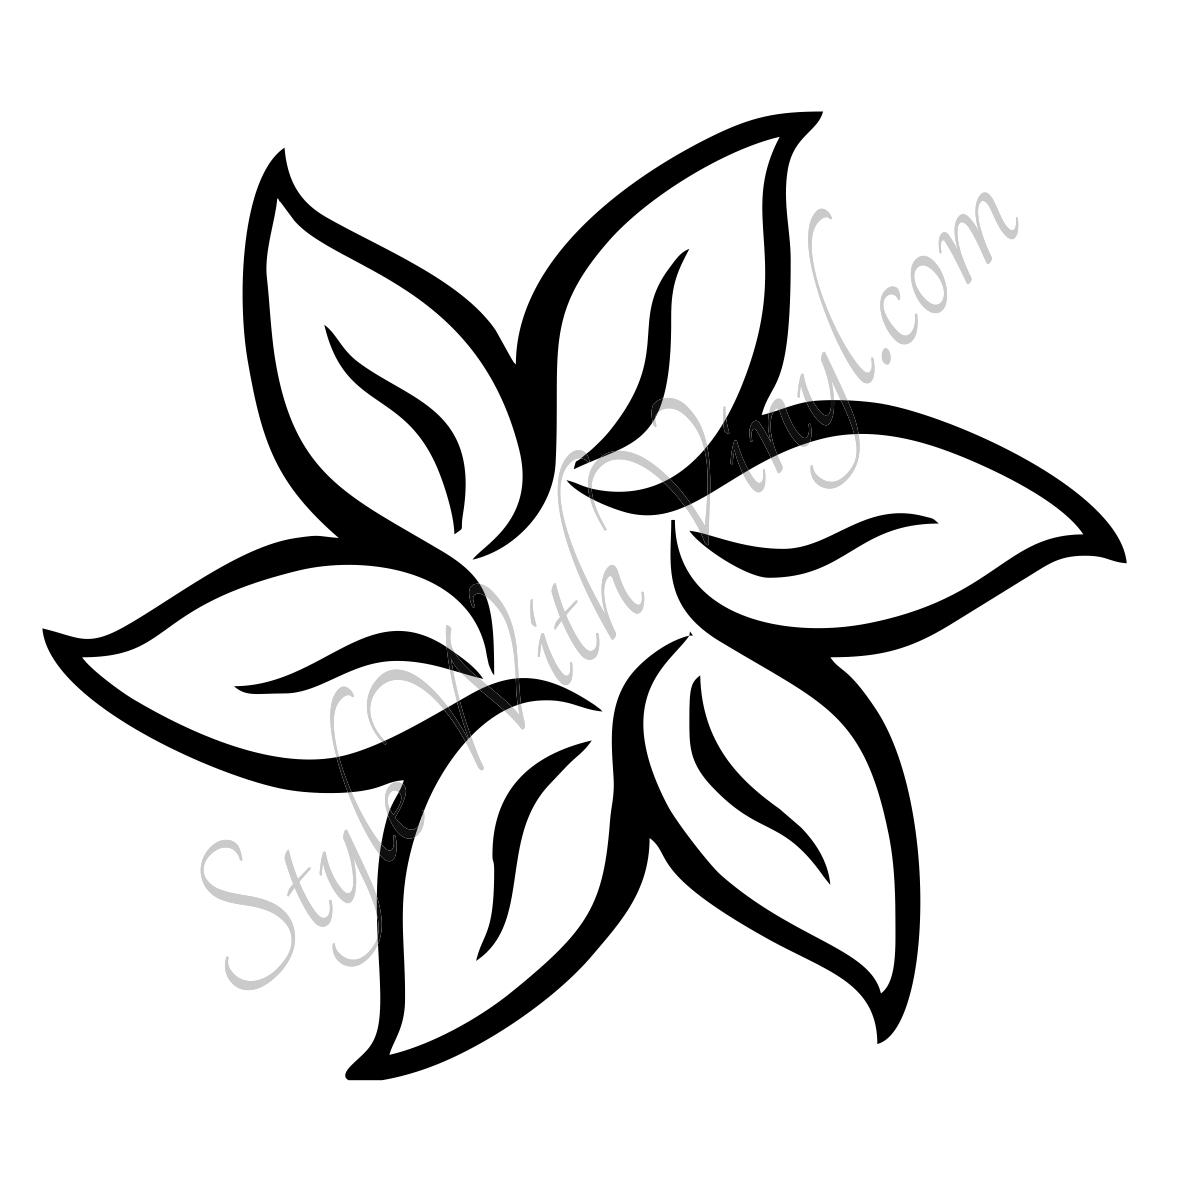 1200x1200 Printable Simple Flower Drawings 11 Easy Drawing Ideas Draw